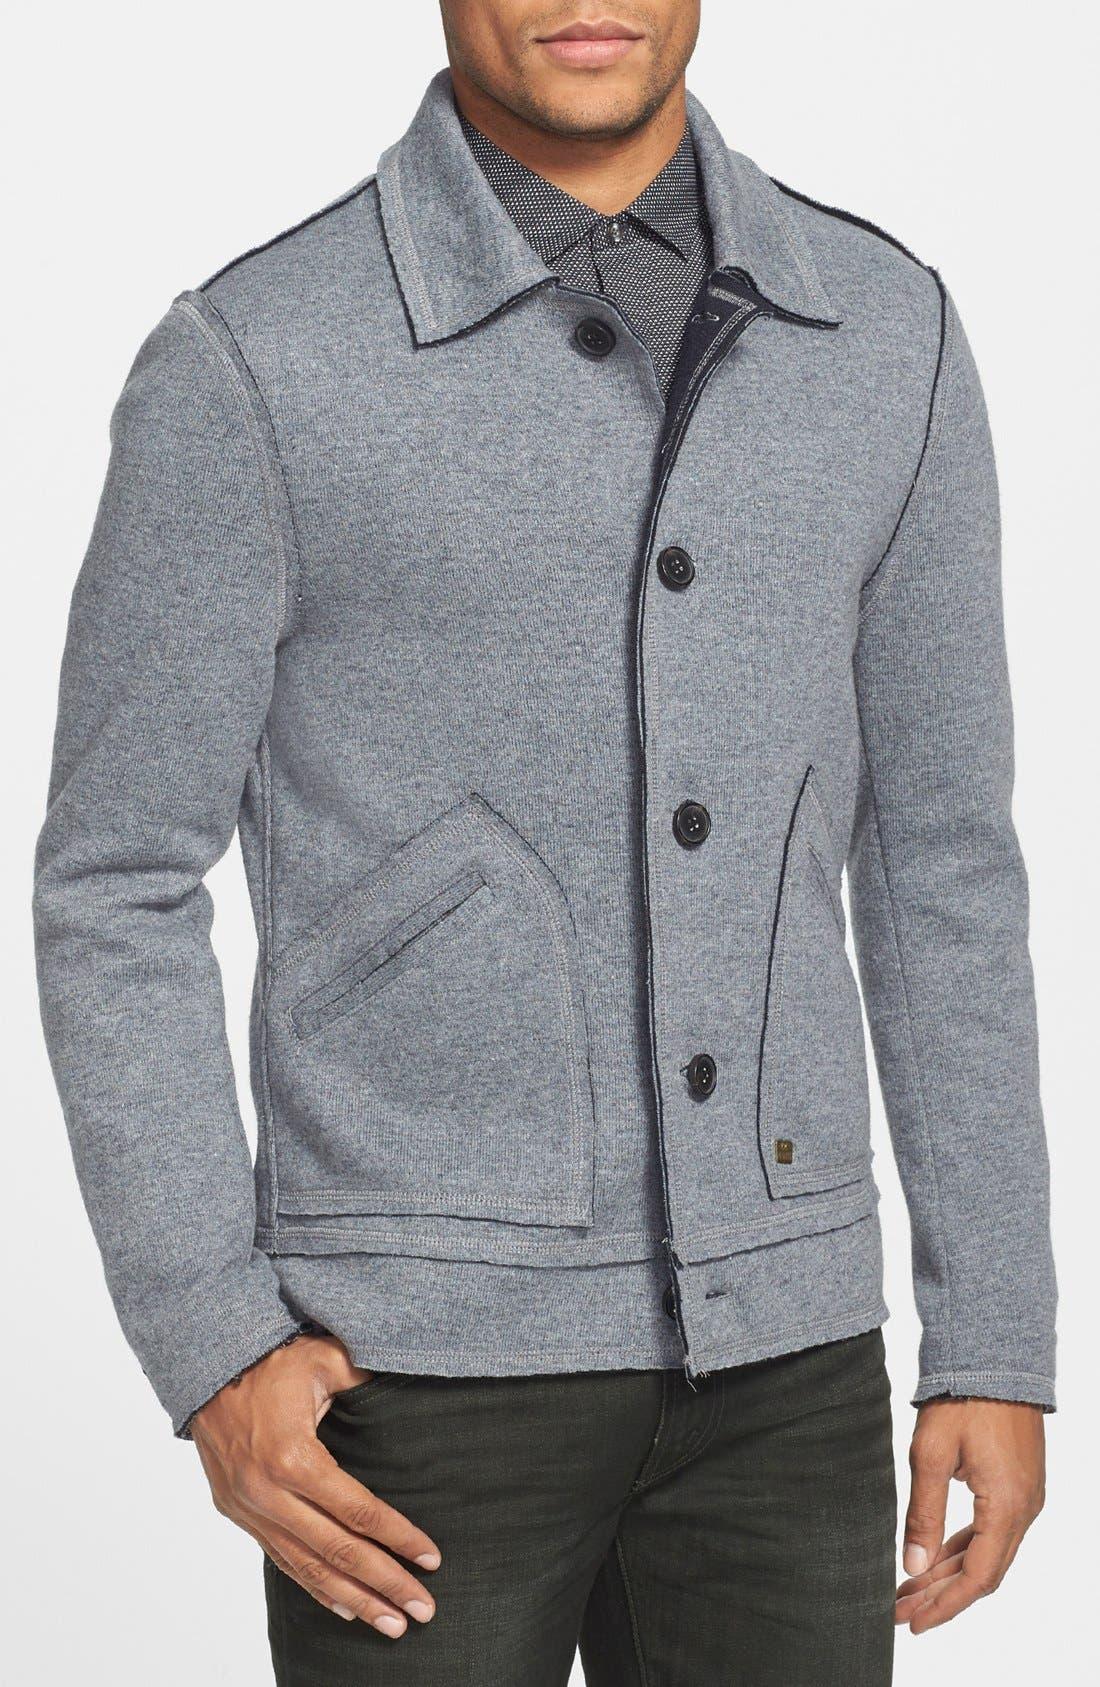 Alternate Image 1 Selected - Antony Morato Wool Blend Jacket